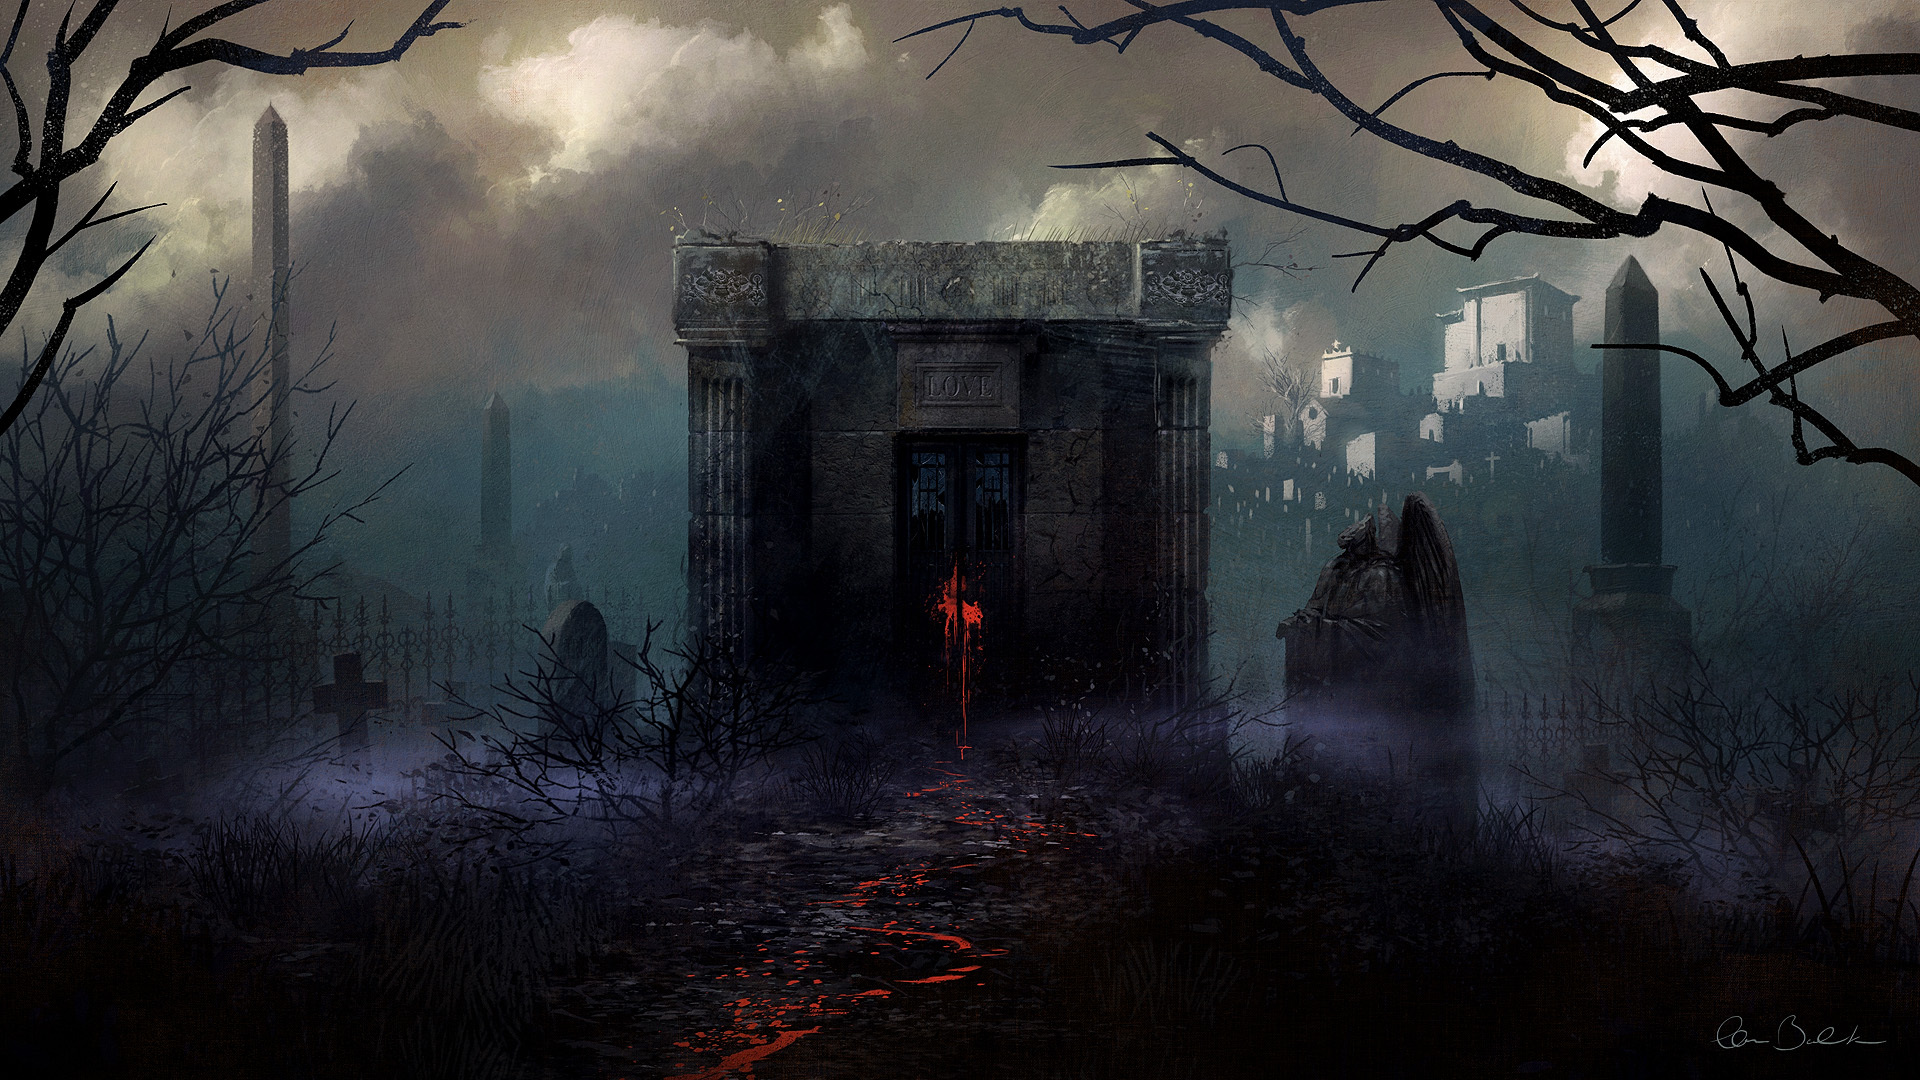 gothic christopher balaskas fog fantasy halloween blood spooky wallpaper 1920x1080 151677 wallpaperup